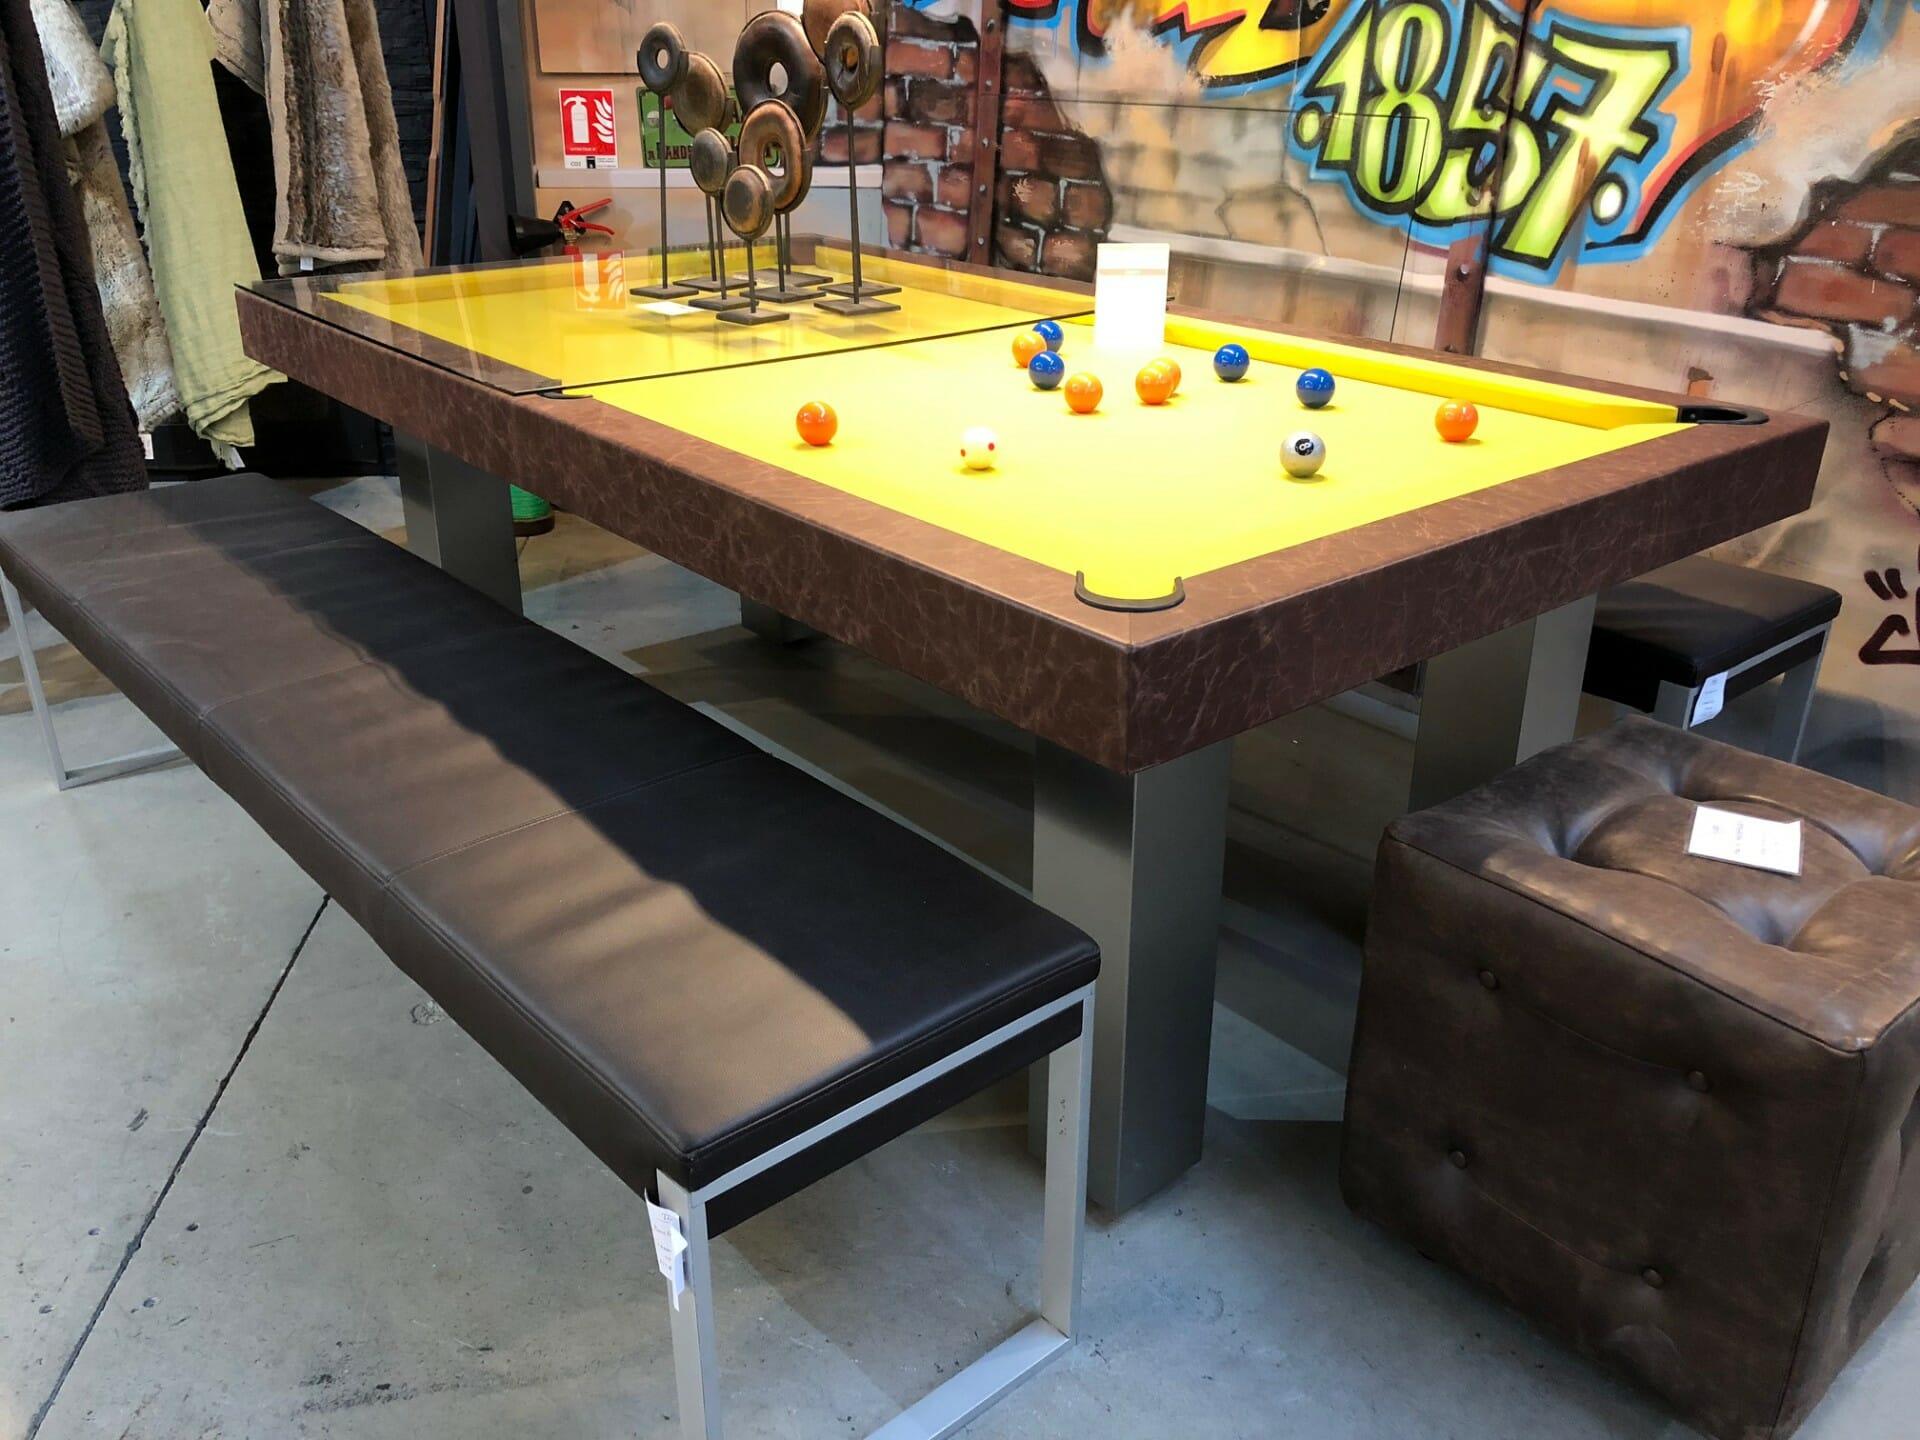 vente de billard pas cher purity leather billard toulet. Black Bedroom Furniture Sets. Home Design Ideas